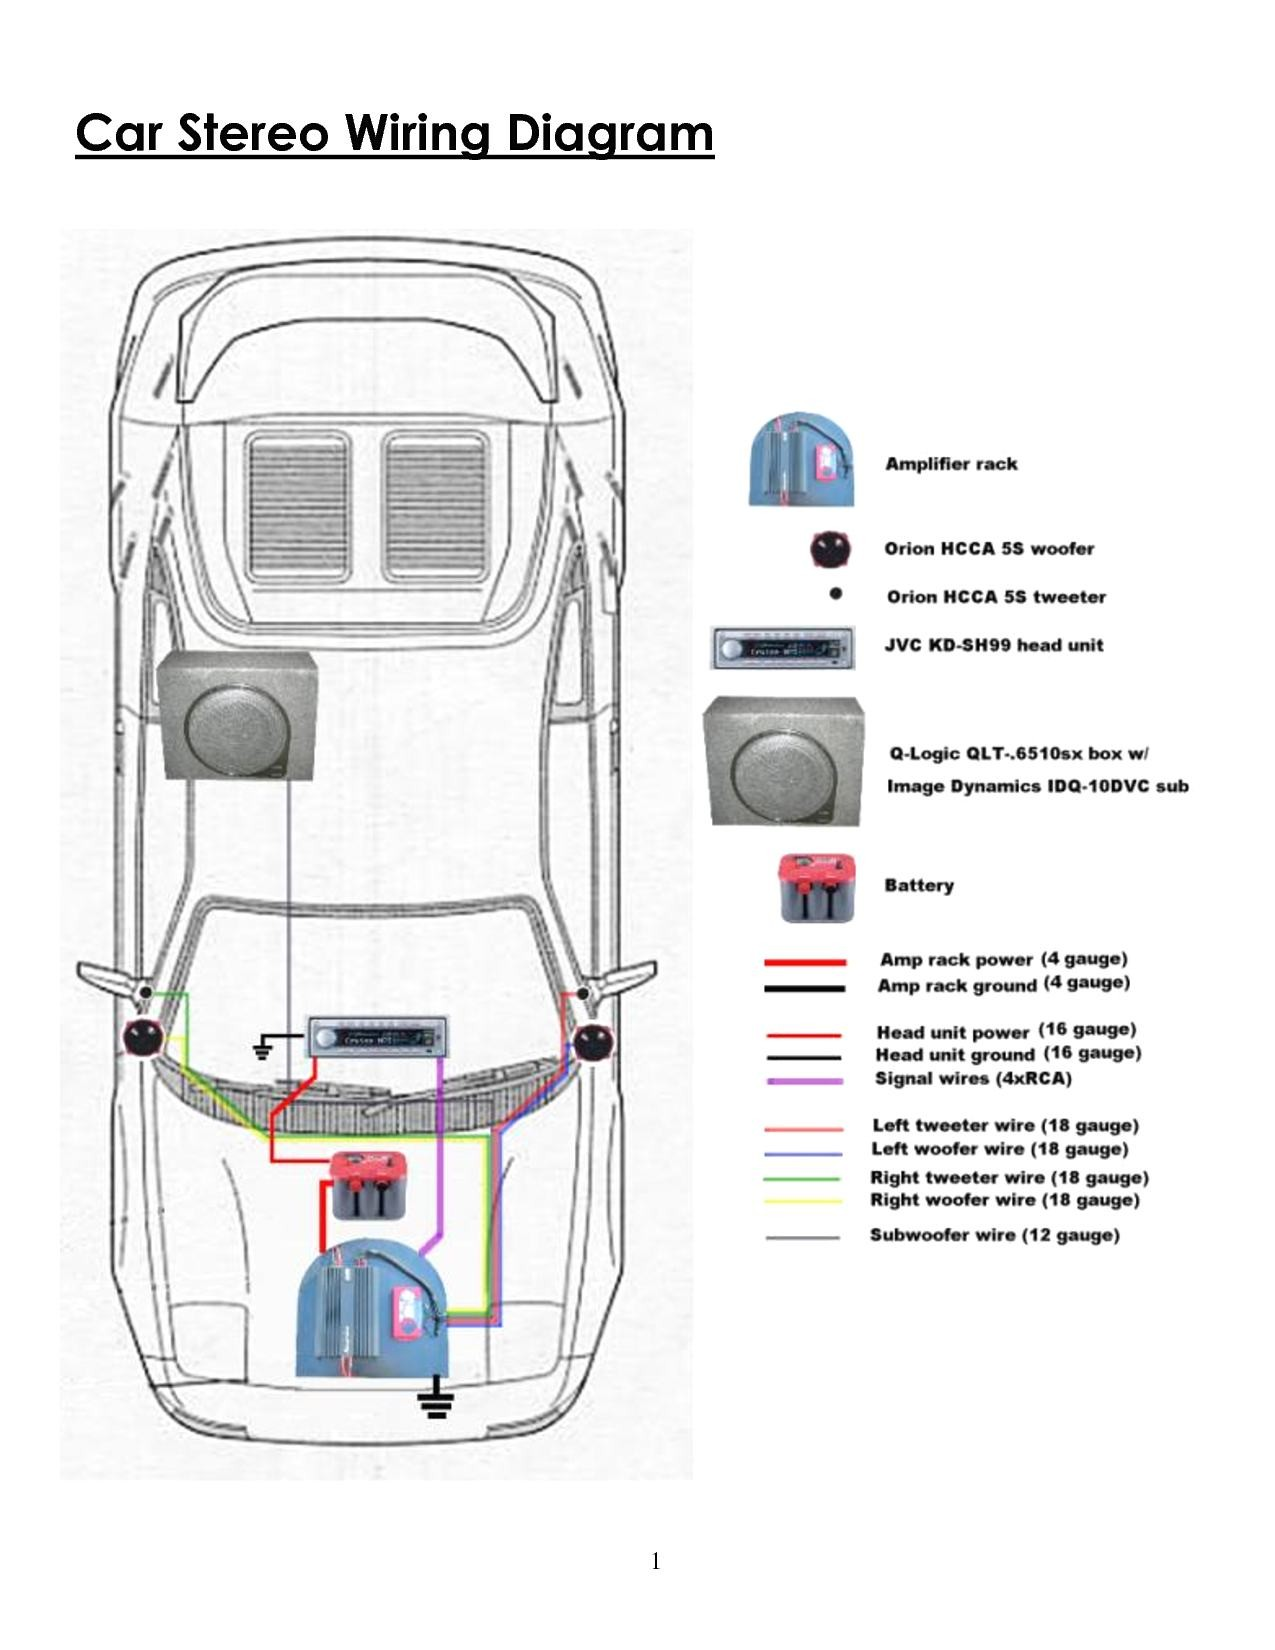 jvc kd g110 wiring diagram tl 9982  jvc car stereo wiring diagram also pioneer car radio  tl 9982  jvc car stereo wiring diagram